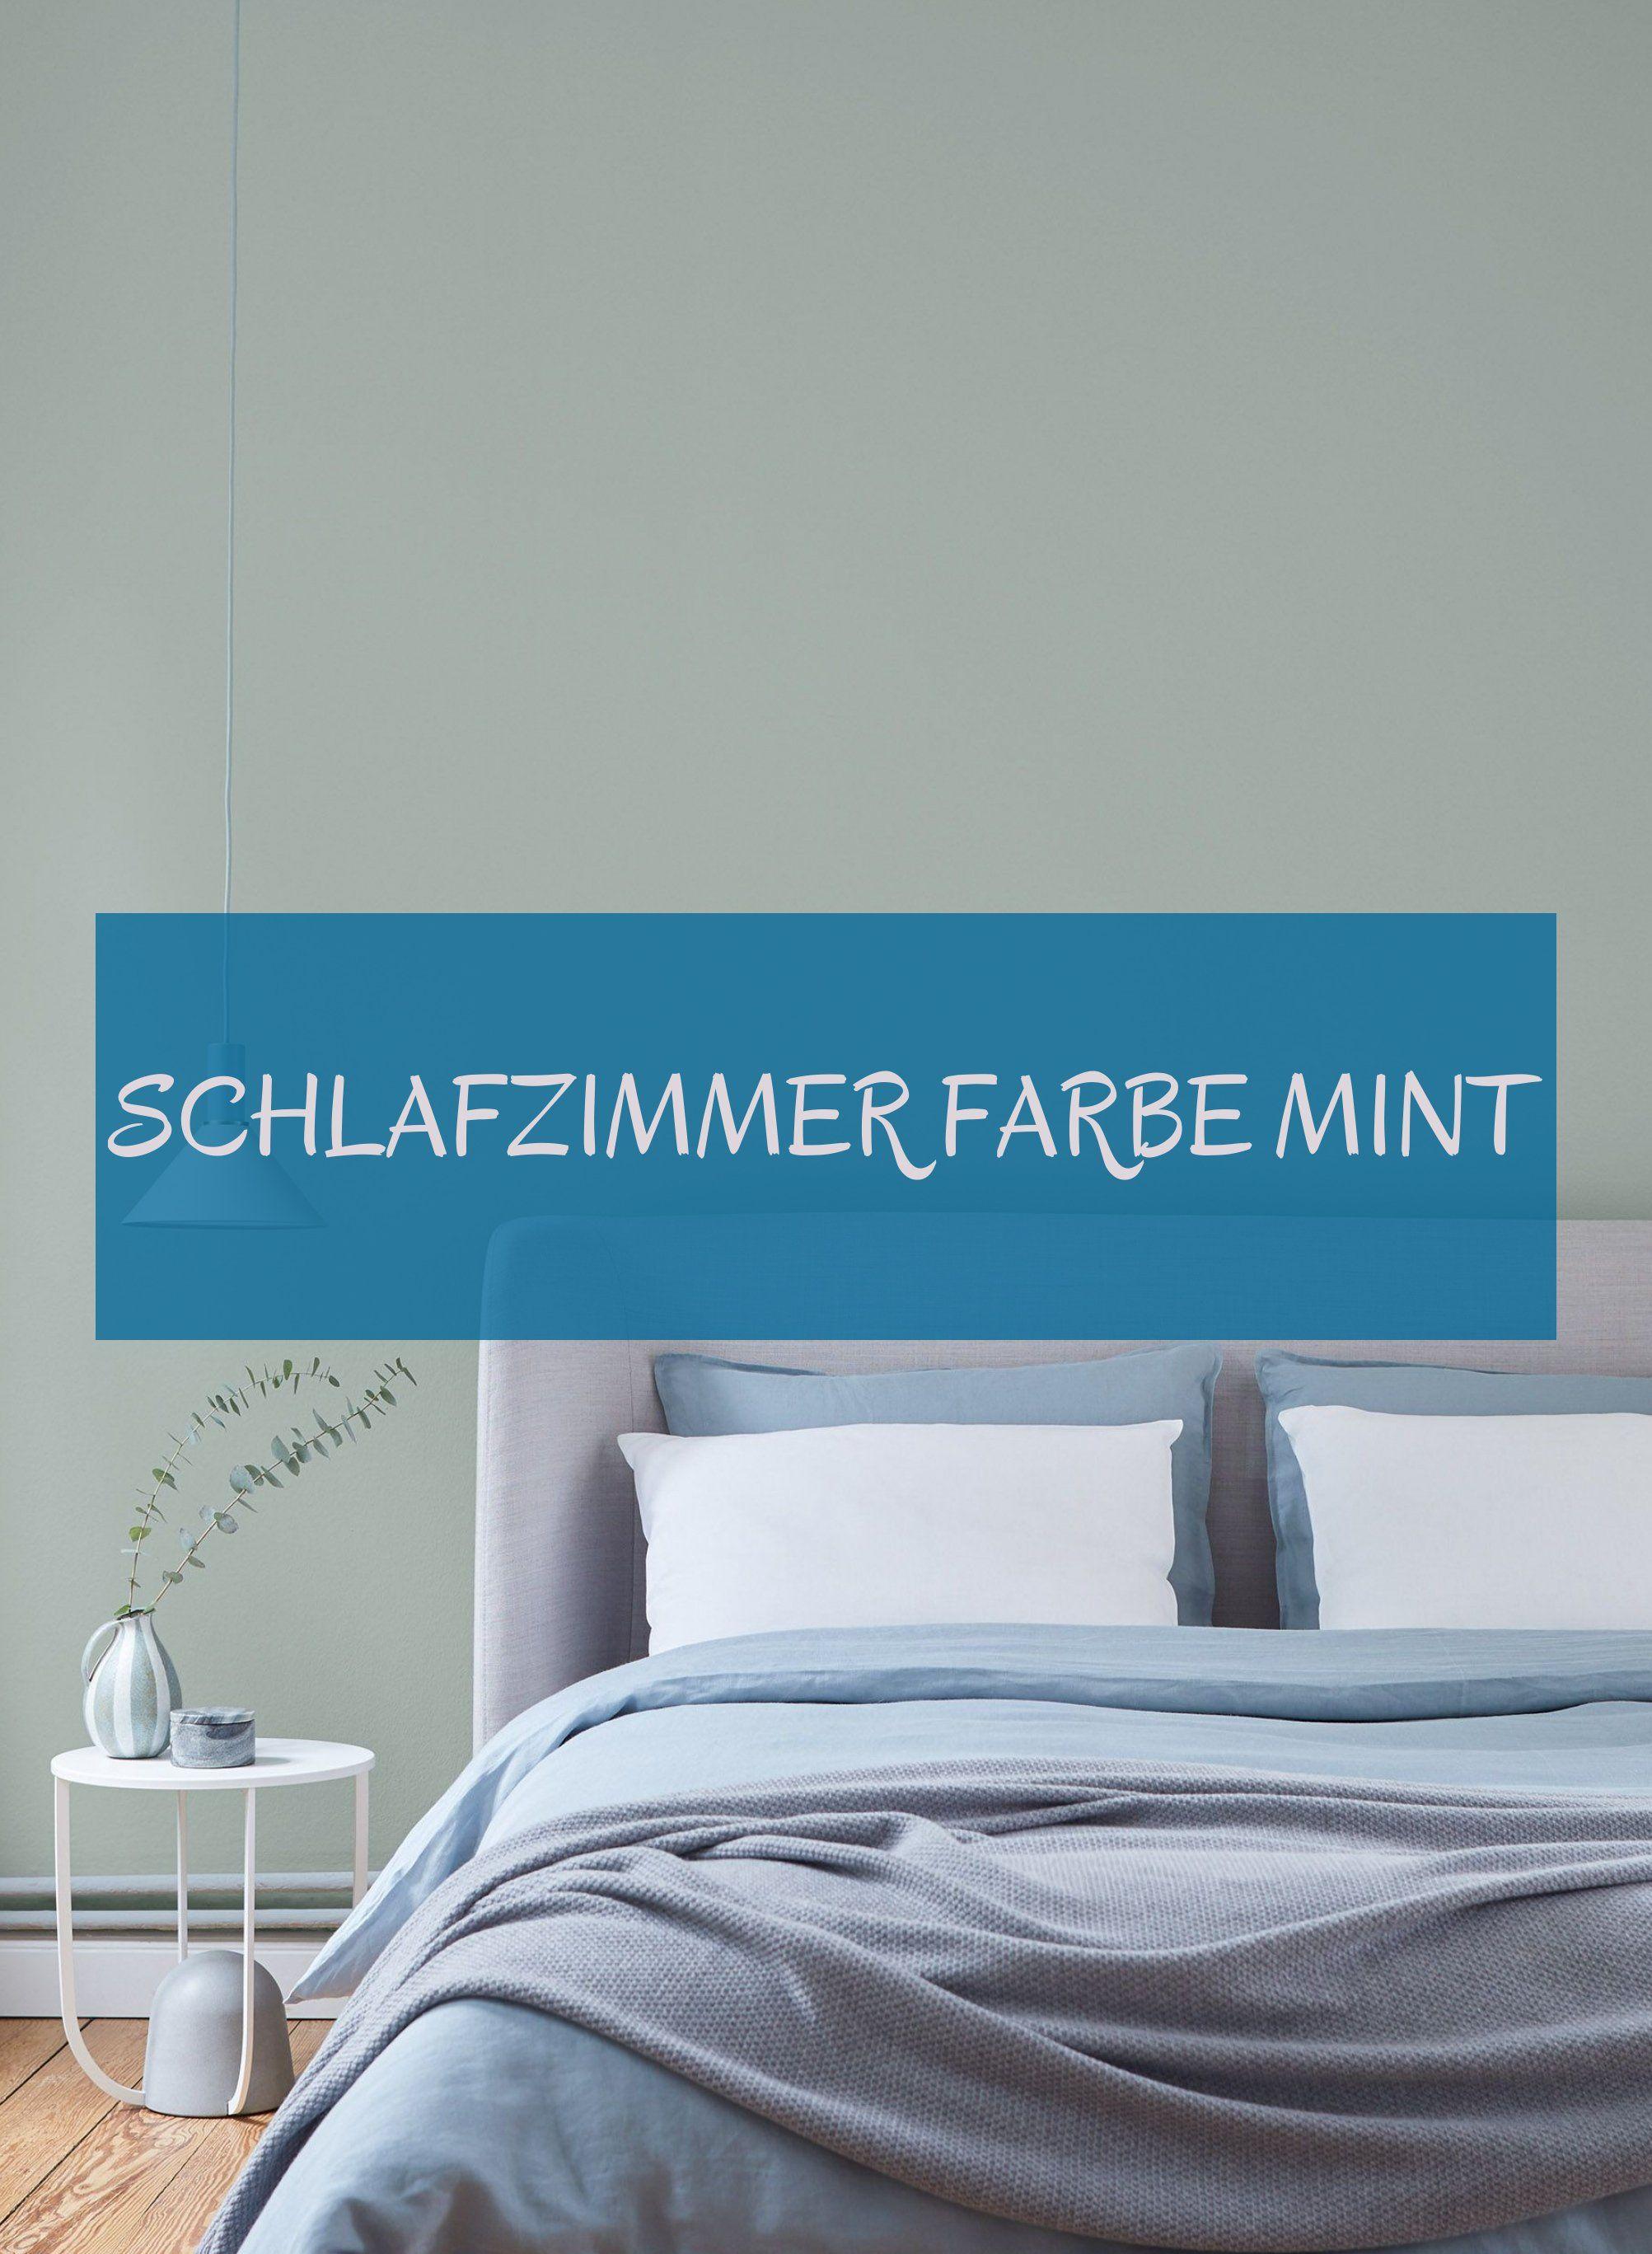 Schlafzimmer Farbe Mint Schlafzimmer Farbe Mint 10 21 2019